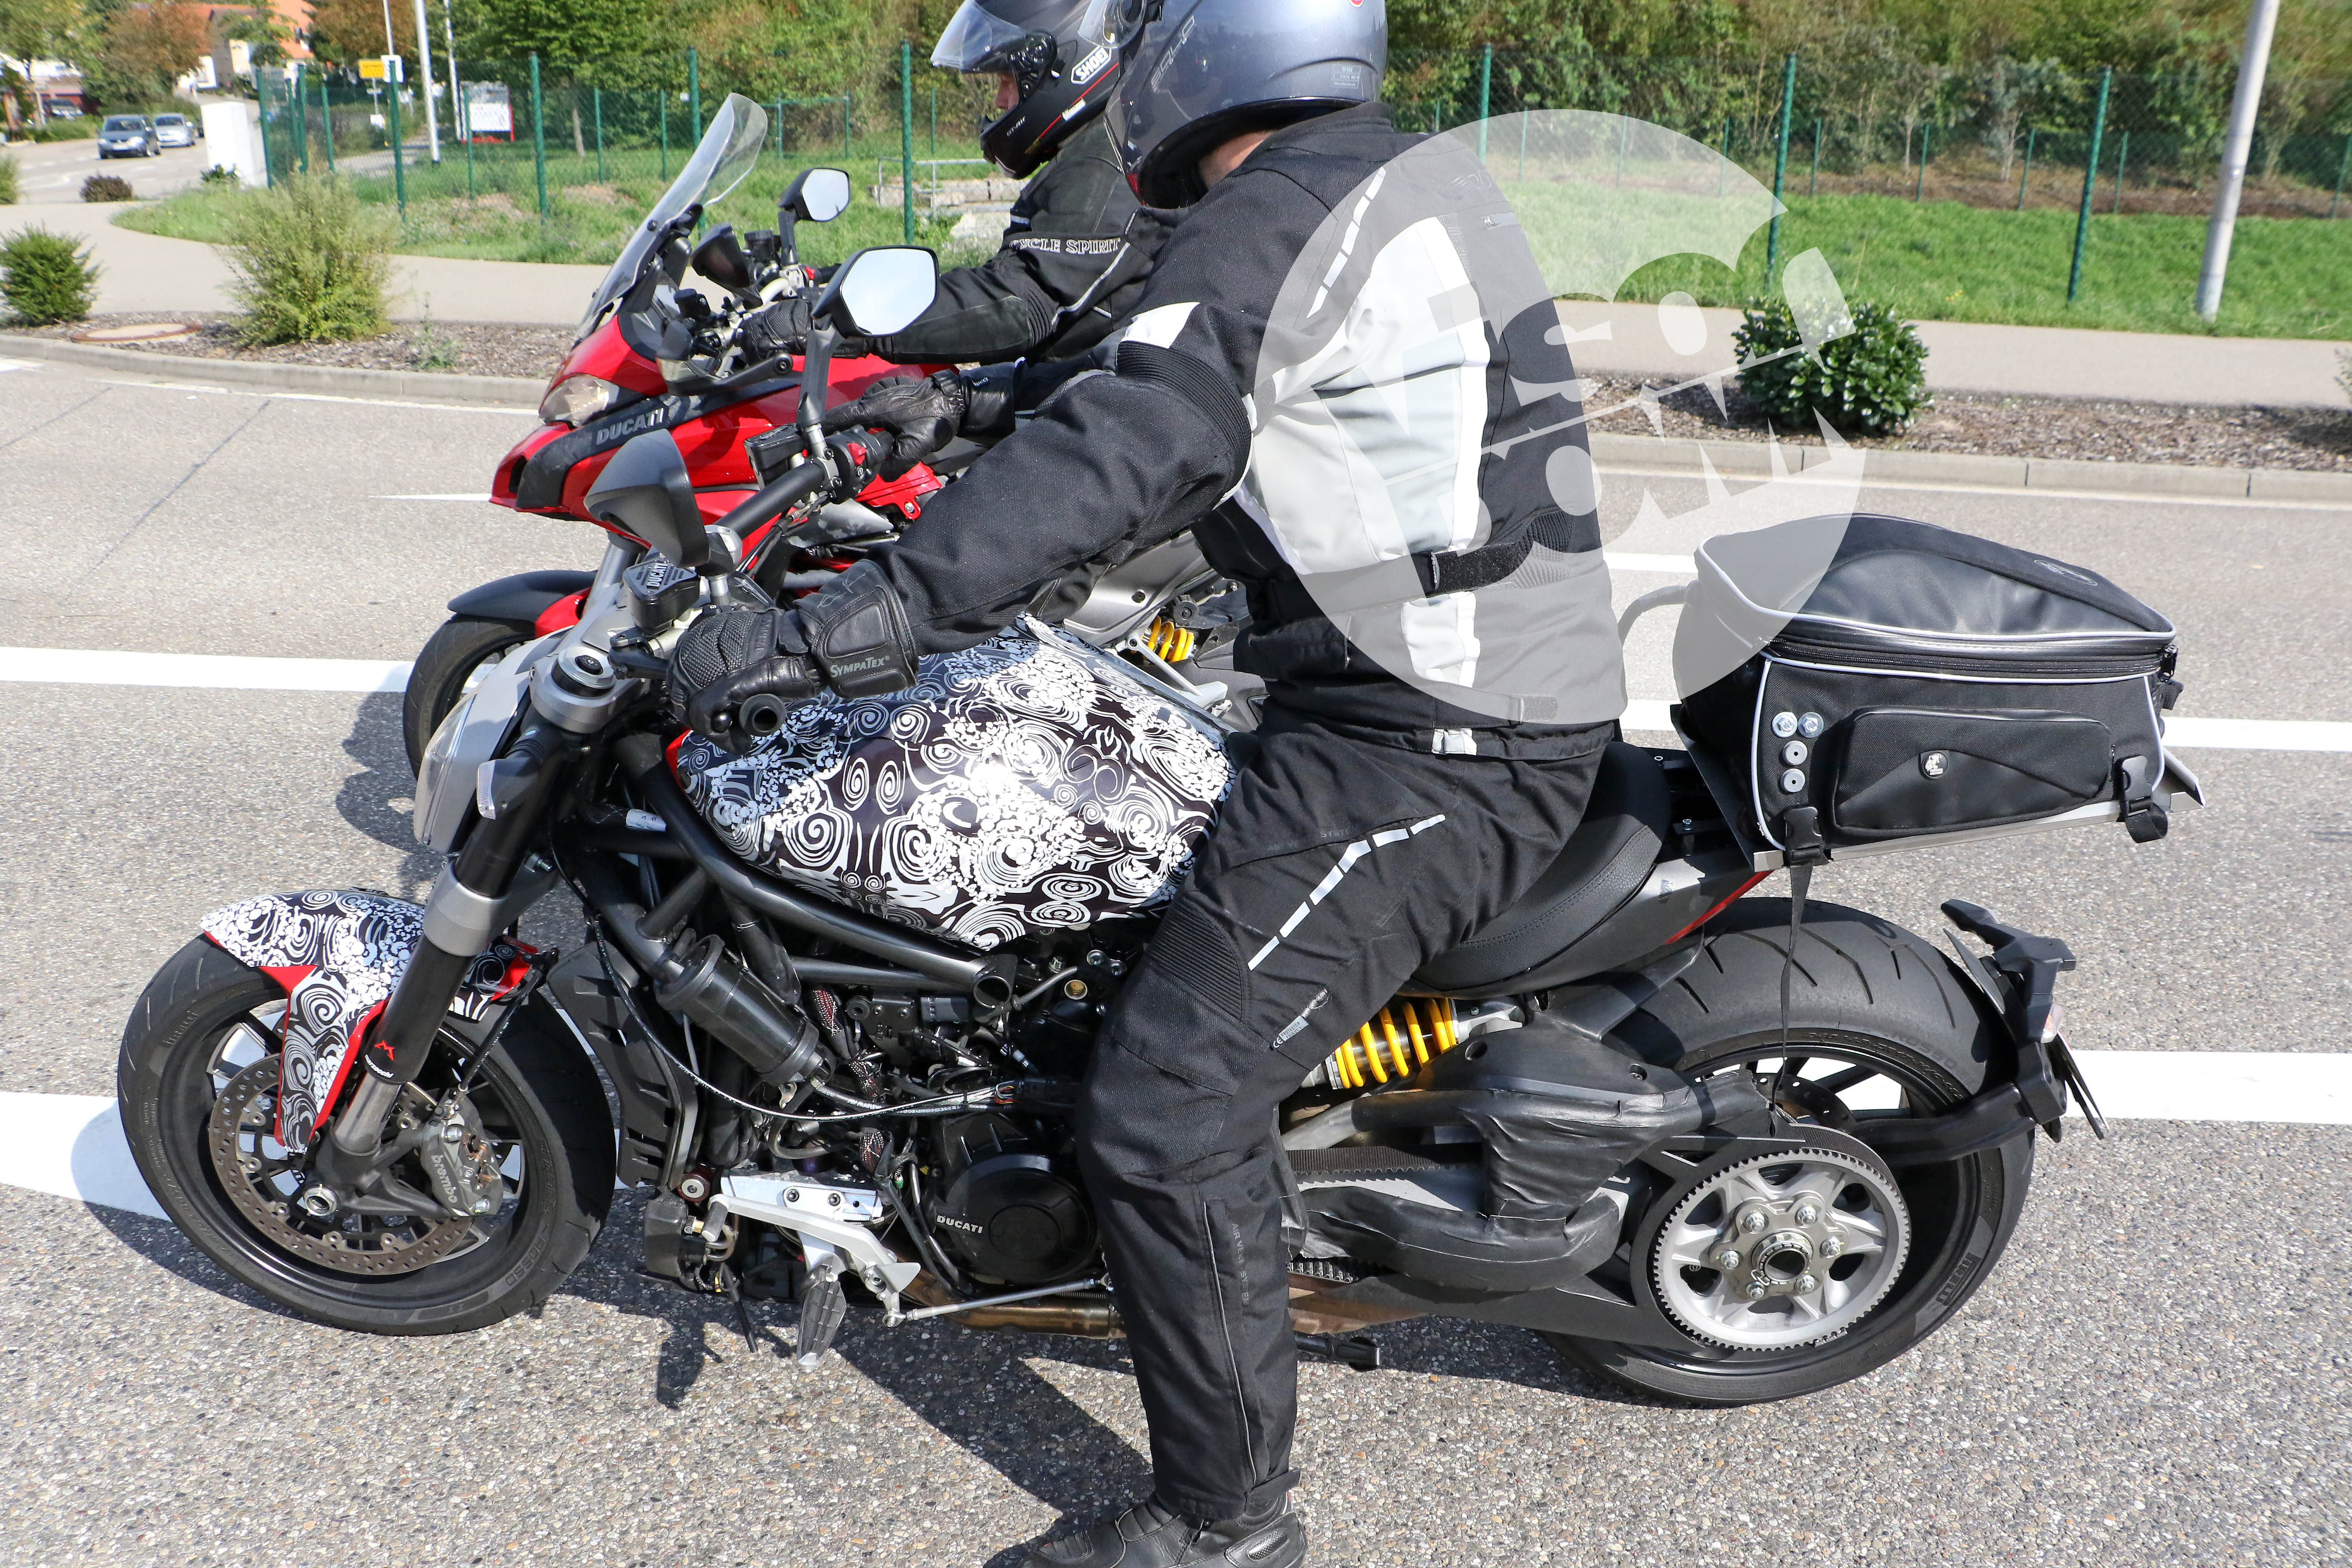 New Ducati Diavel - a better look